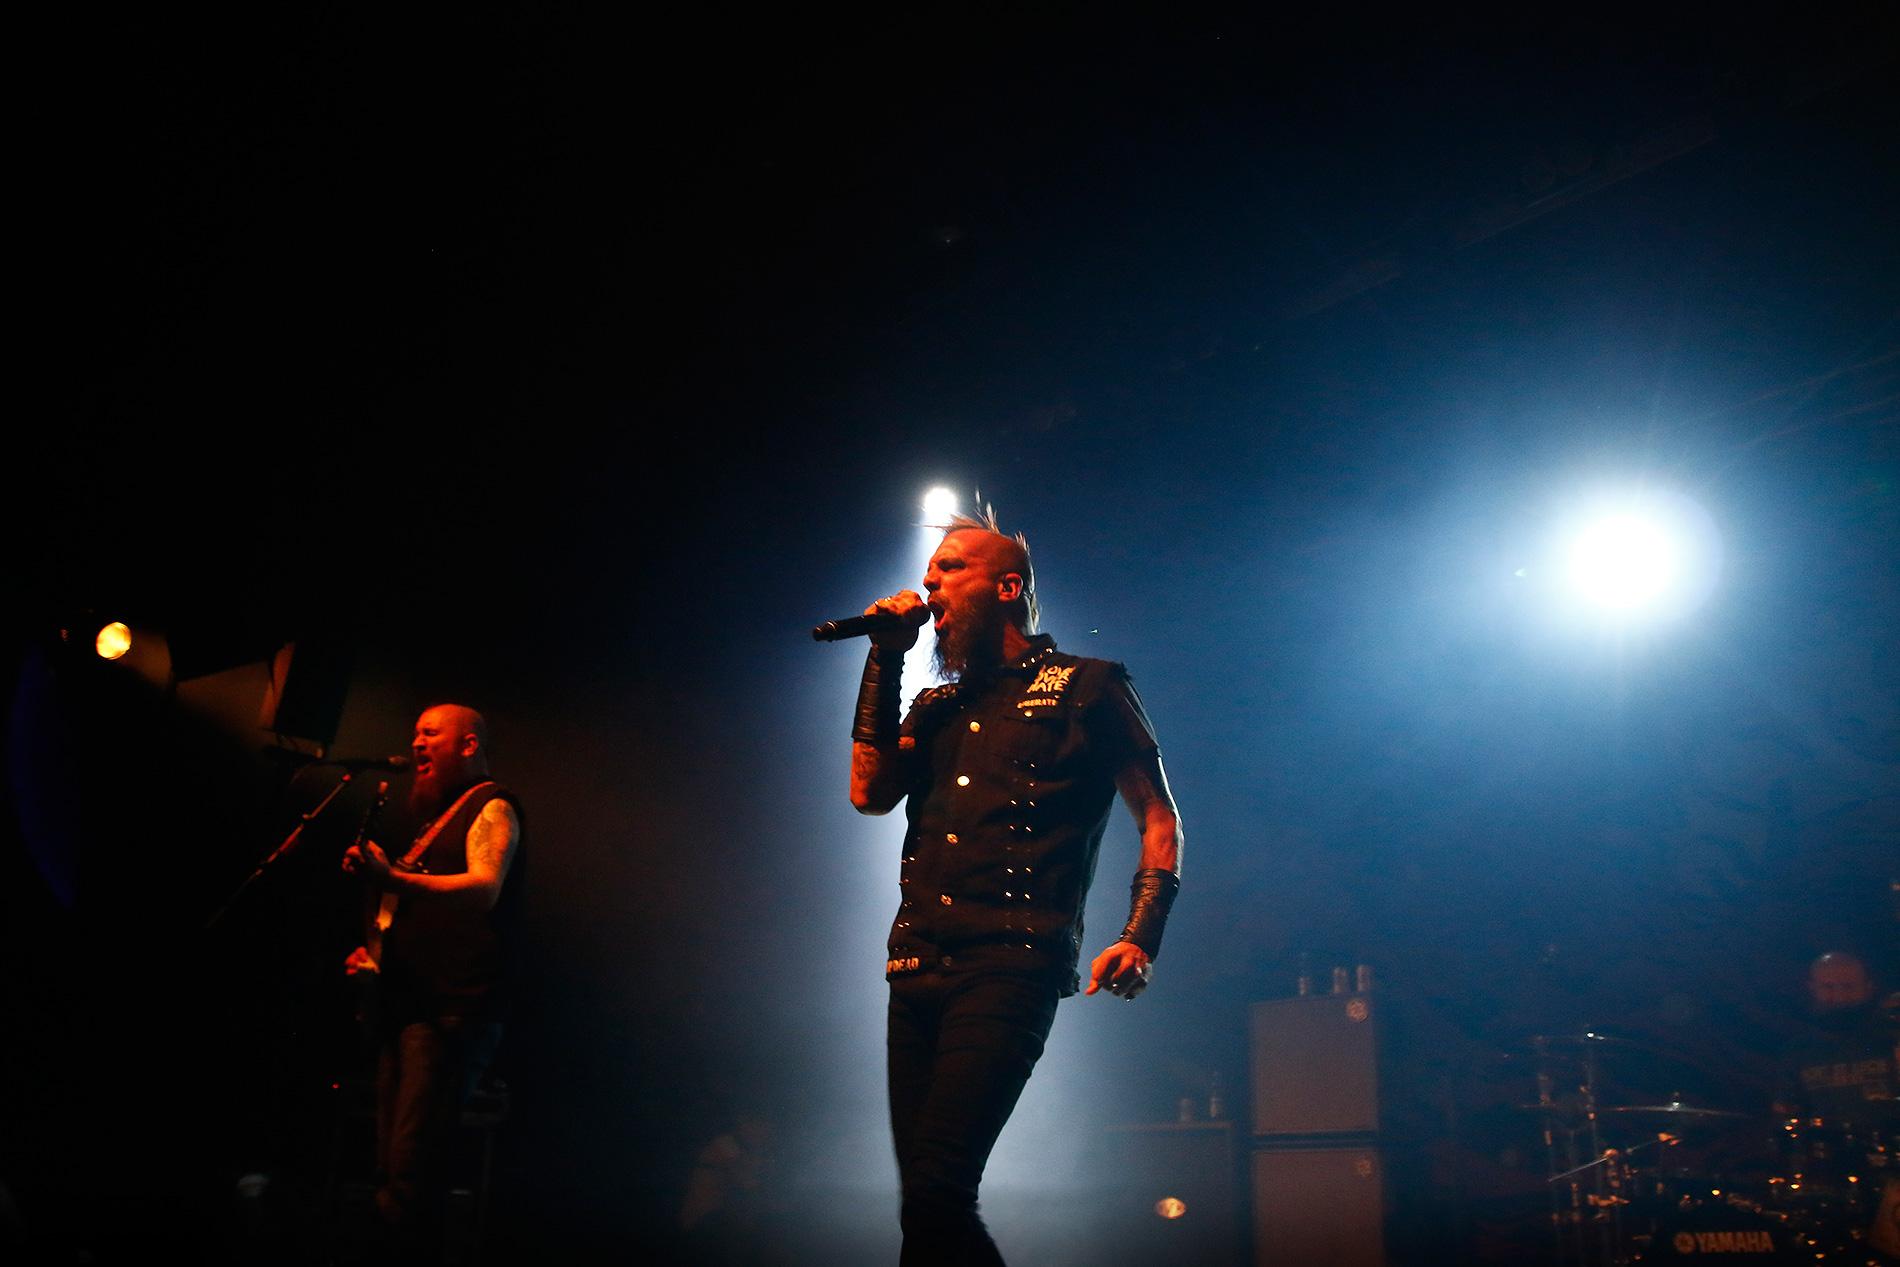 Guitarist Joel Stroetzel (left), vocalist Jesse Leach and drummer Justin Foley. Picture: Tony Öhberg for Finland Today